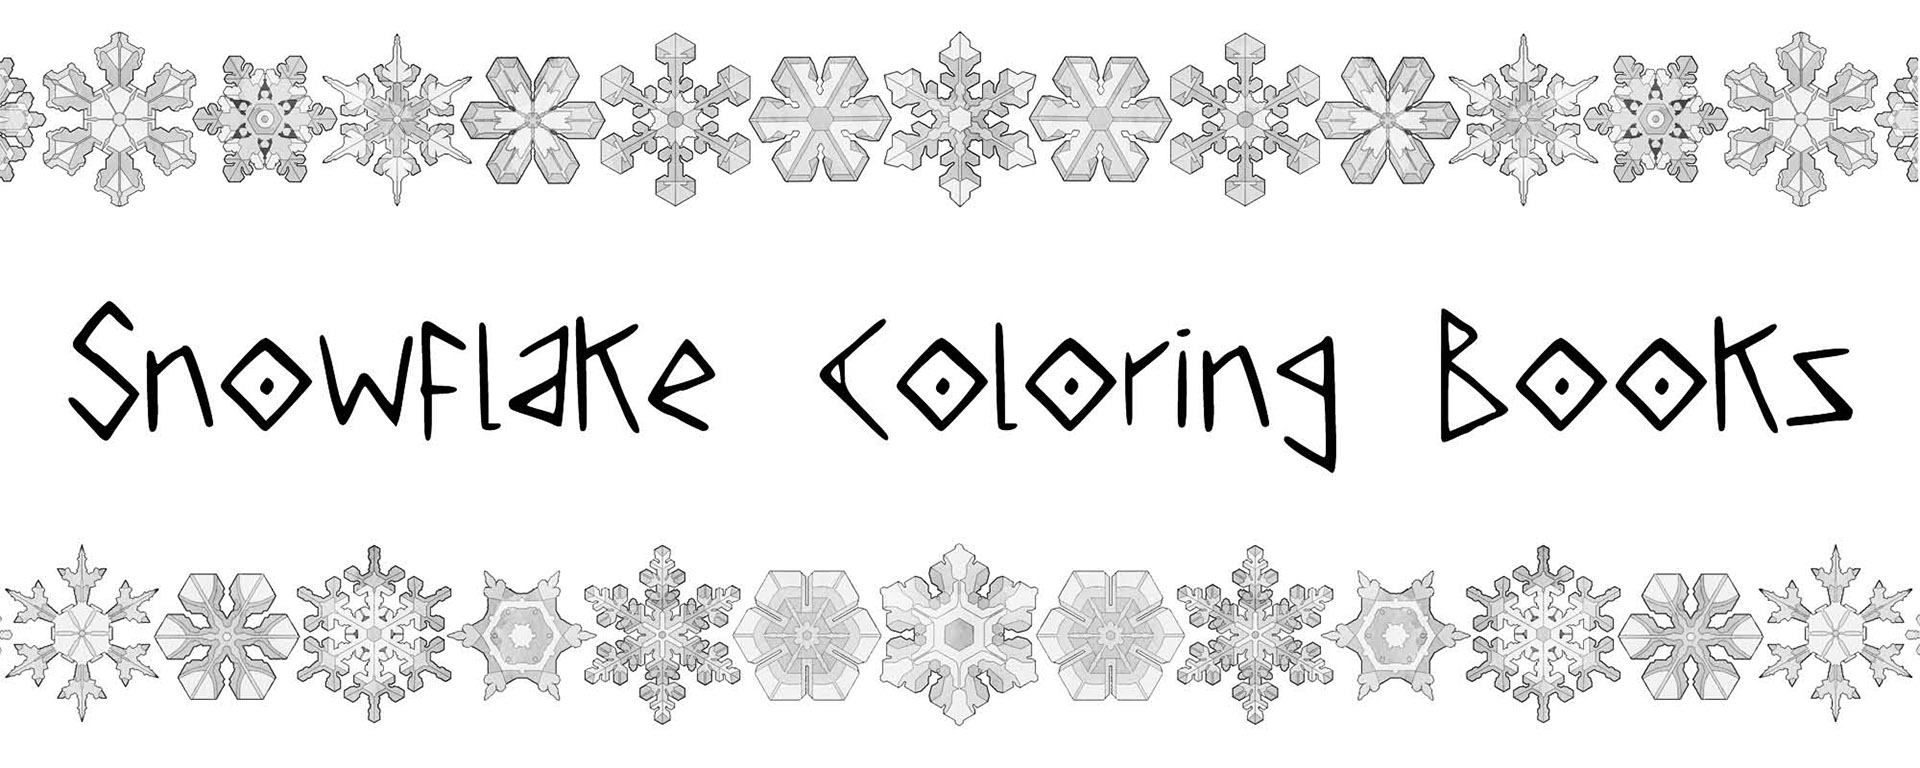 snowflake Page Header